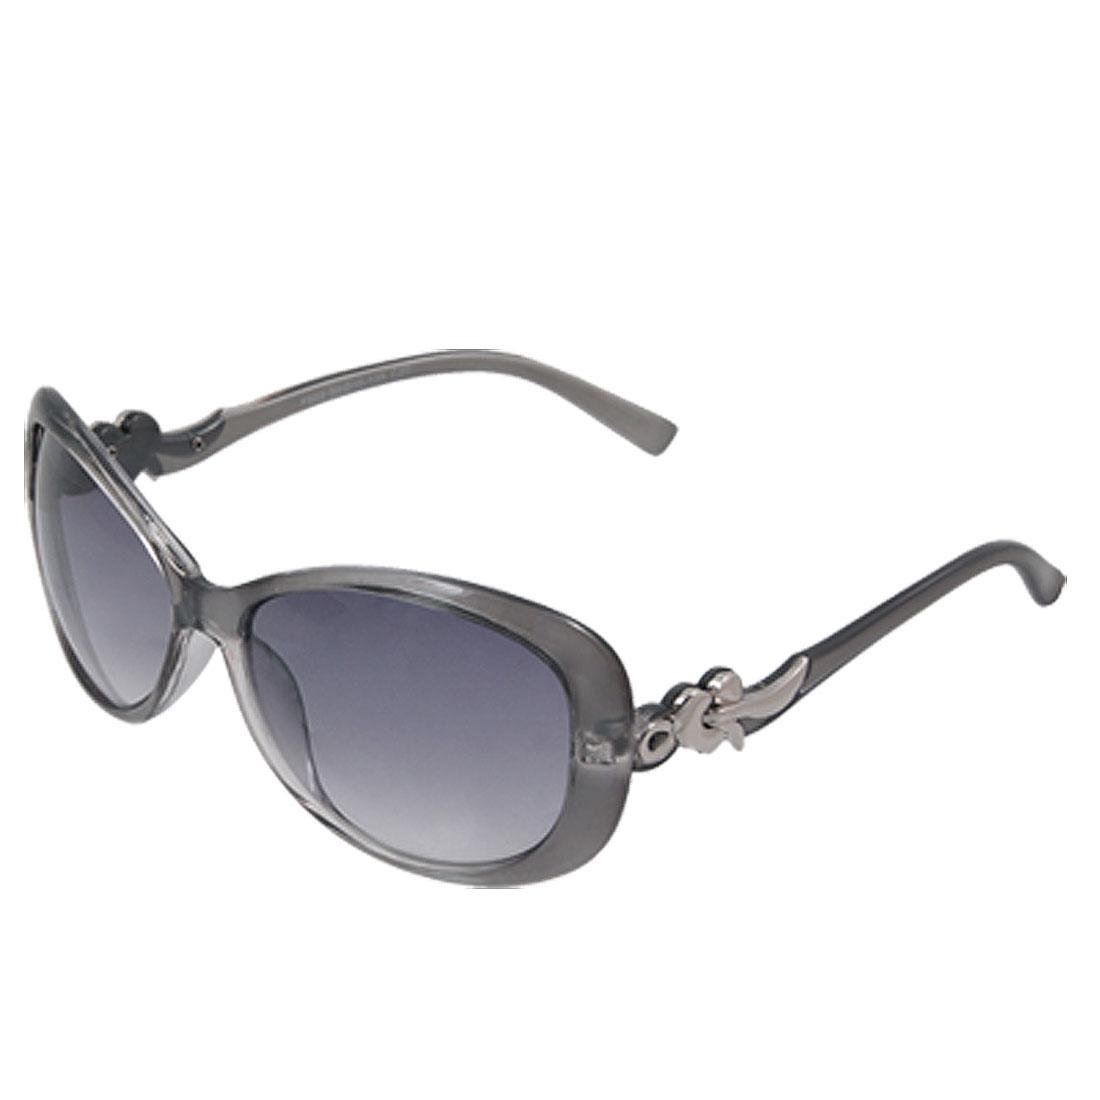 Ladies Wide Lens Eyewear Full-Rim Frame Sunglasses